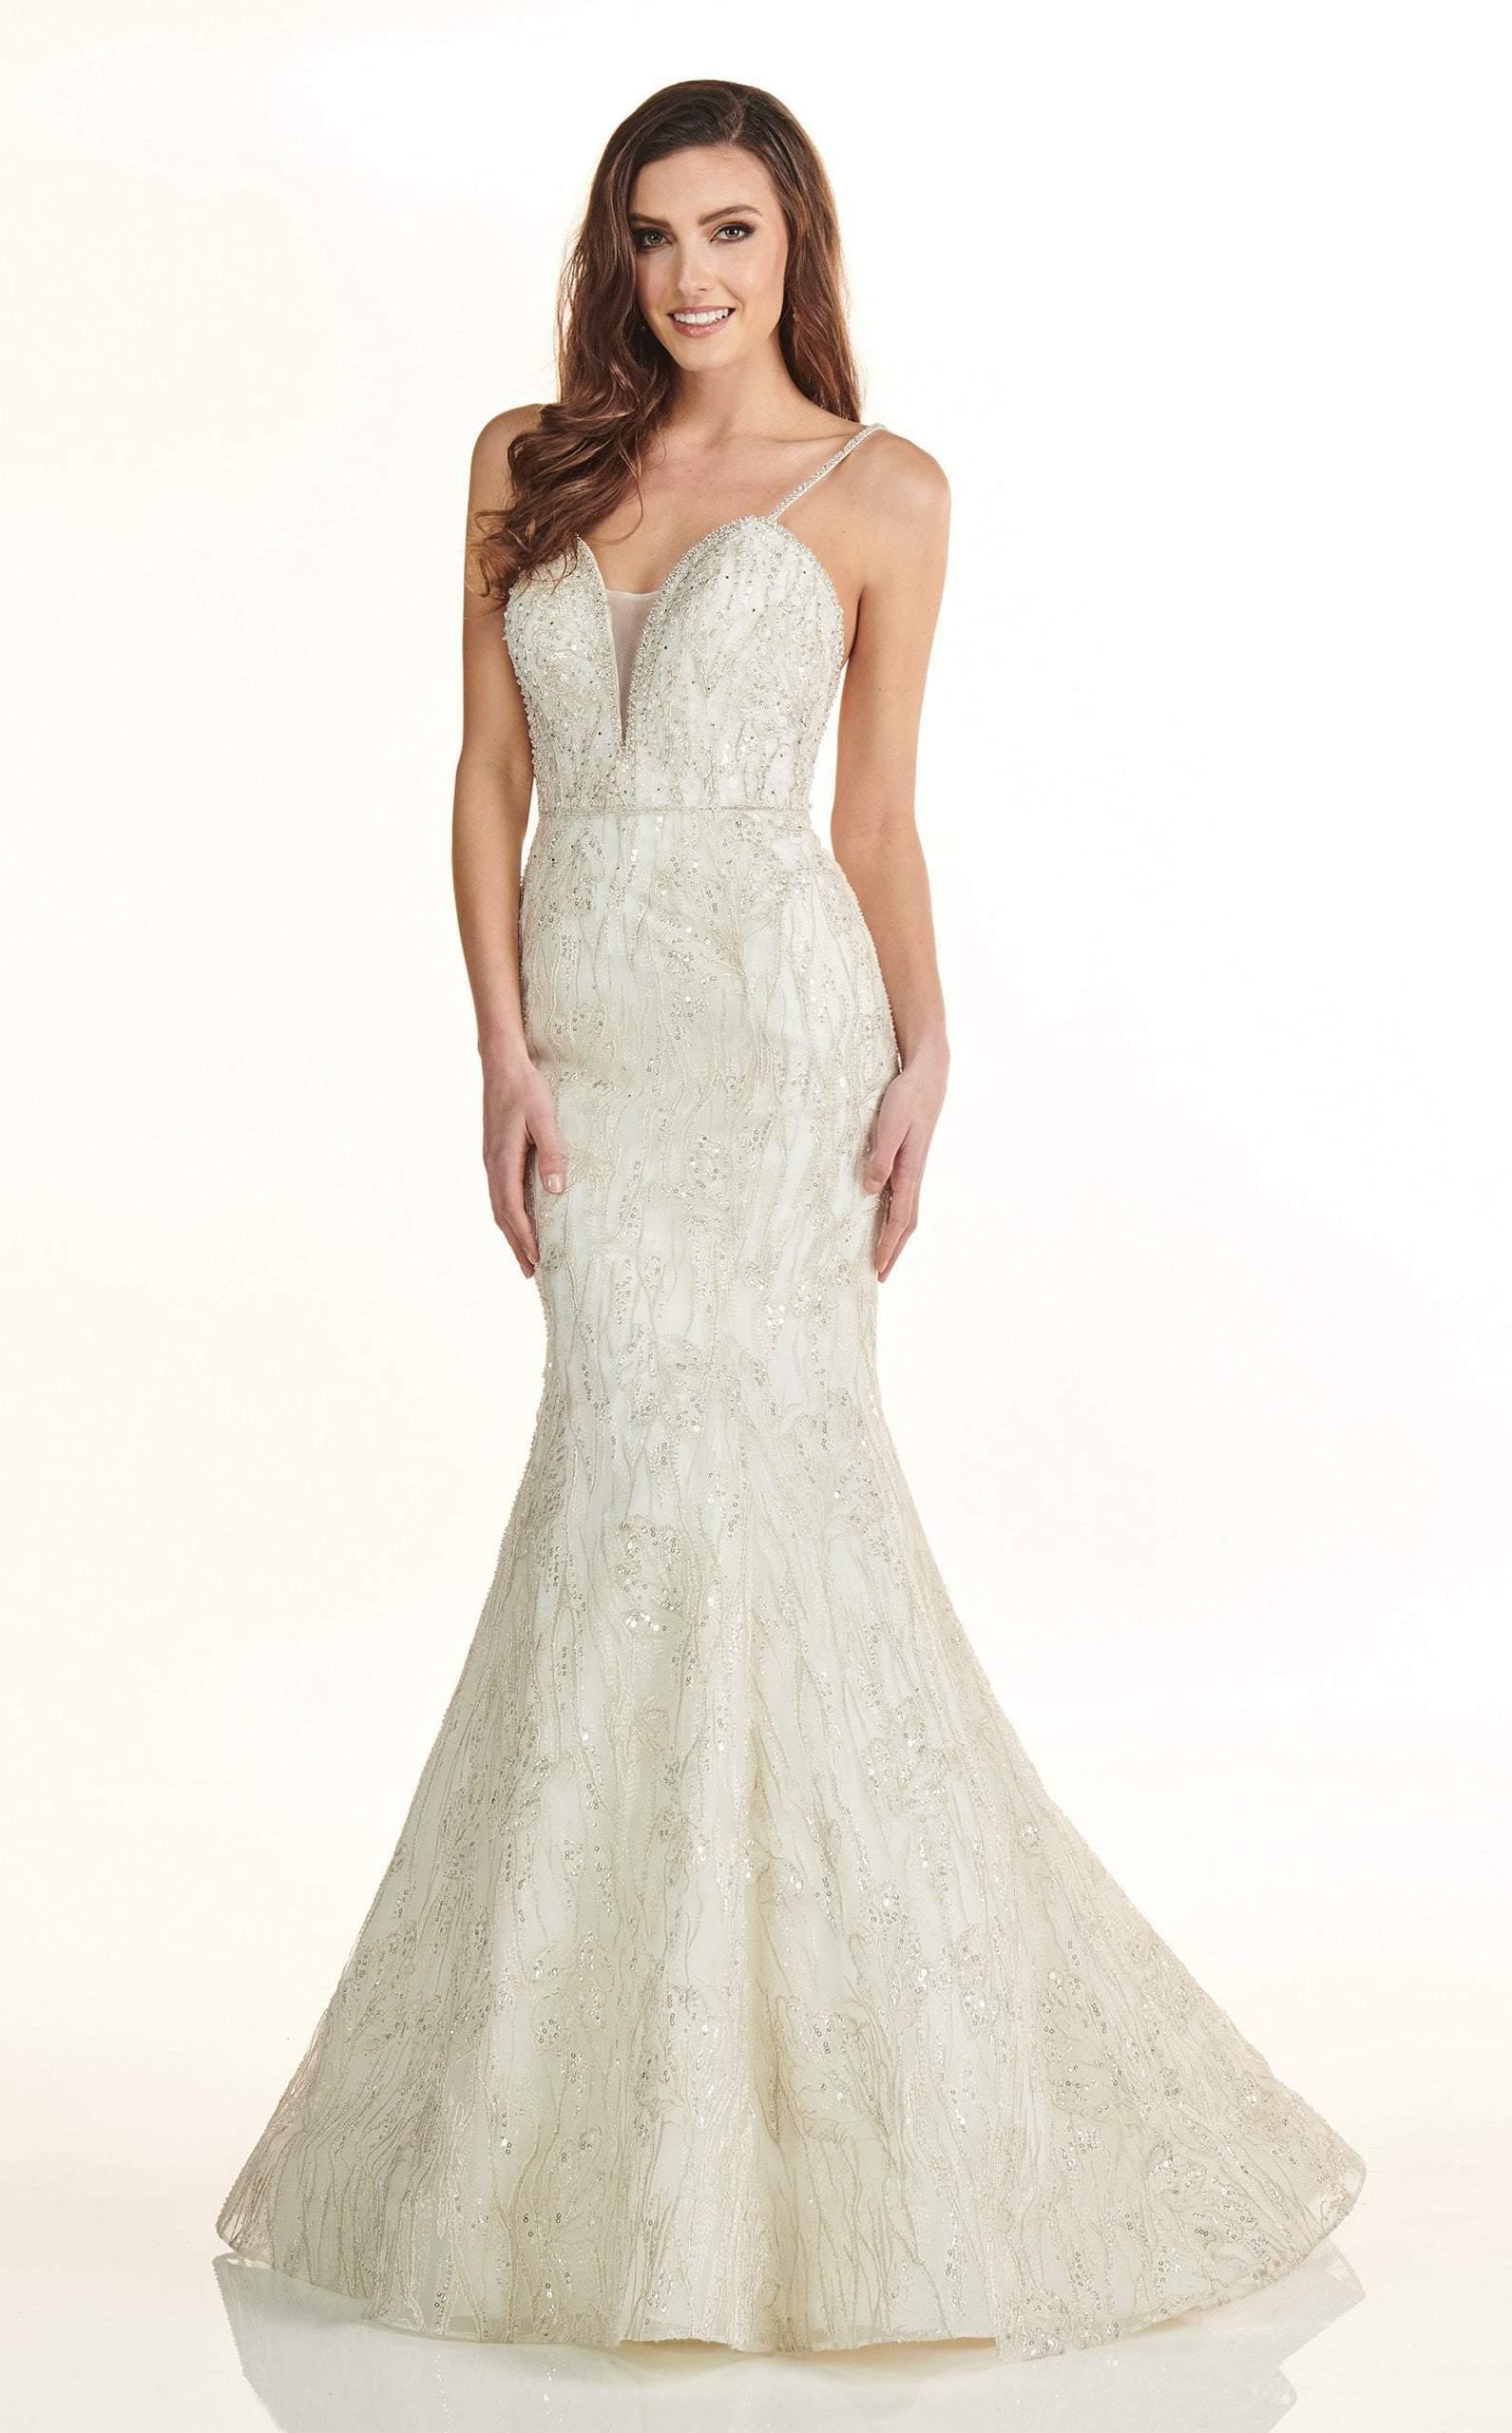 Lo'Adoro by Rachel Allan - M743 Bedazzled Deep Sweetheart Mermaid Gown